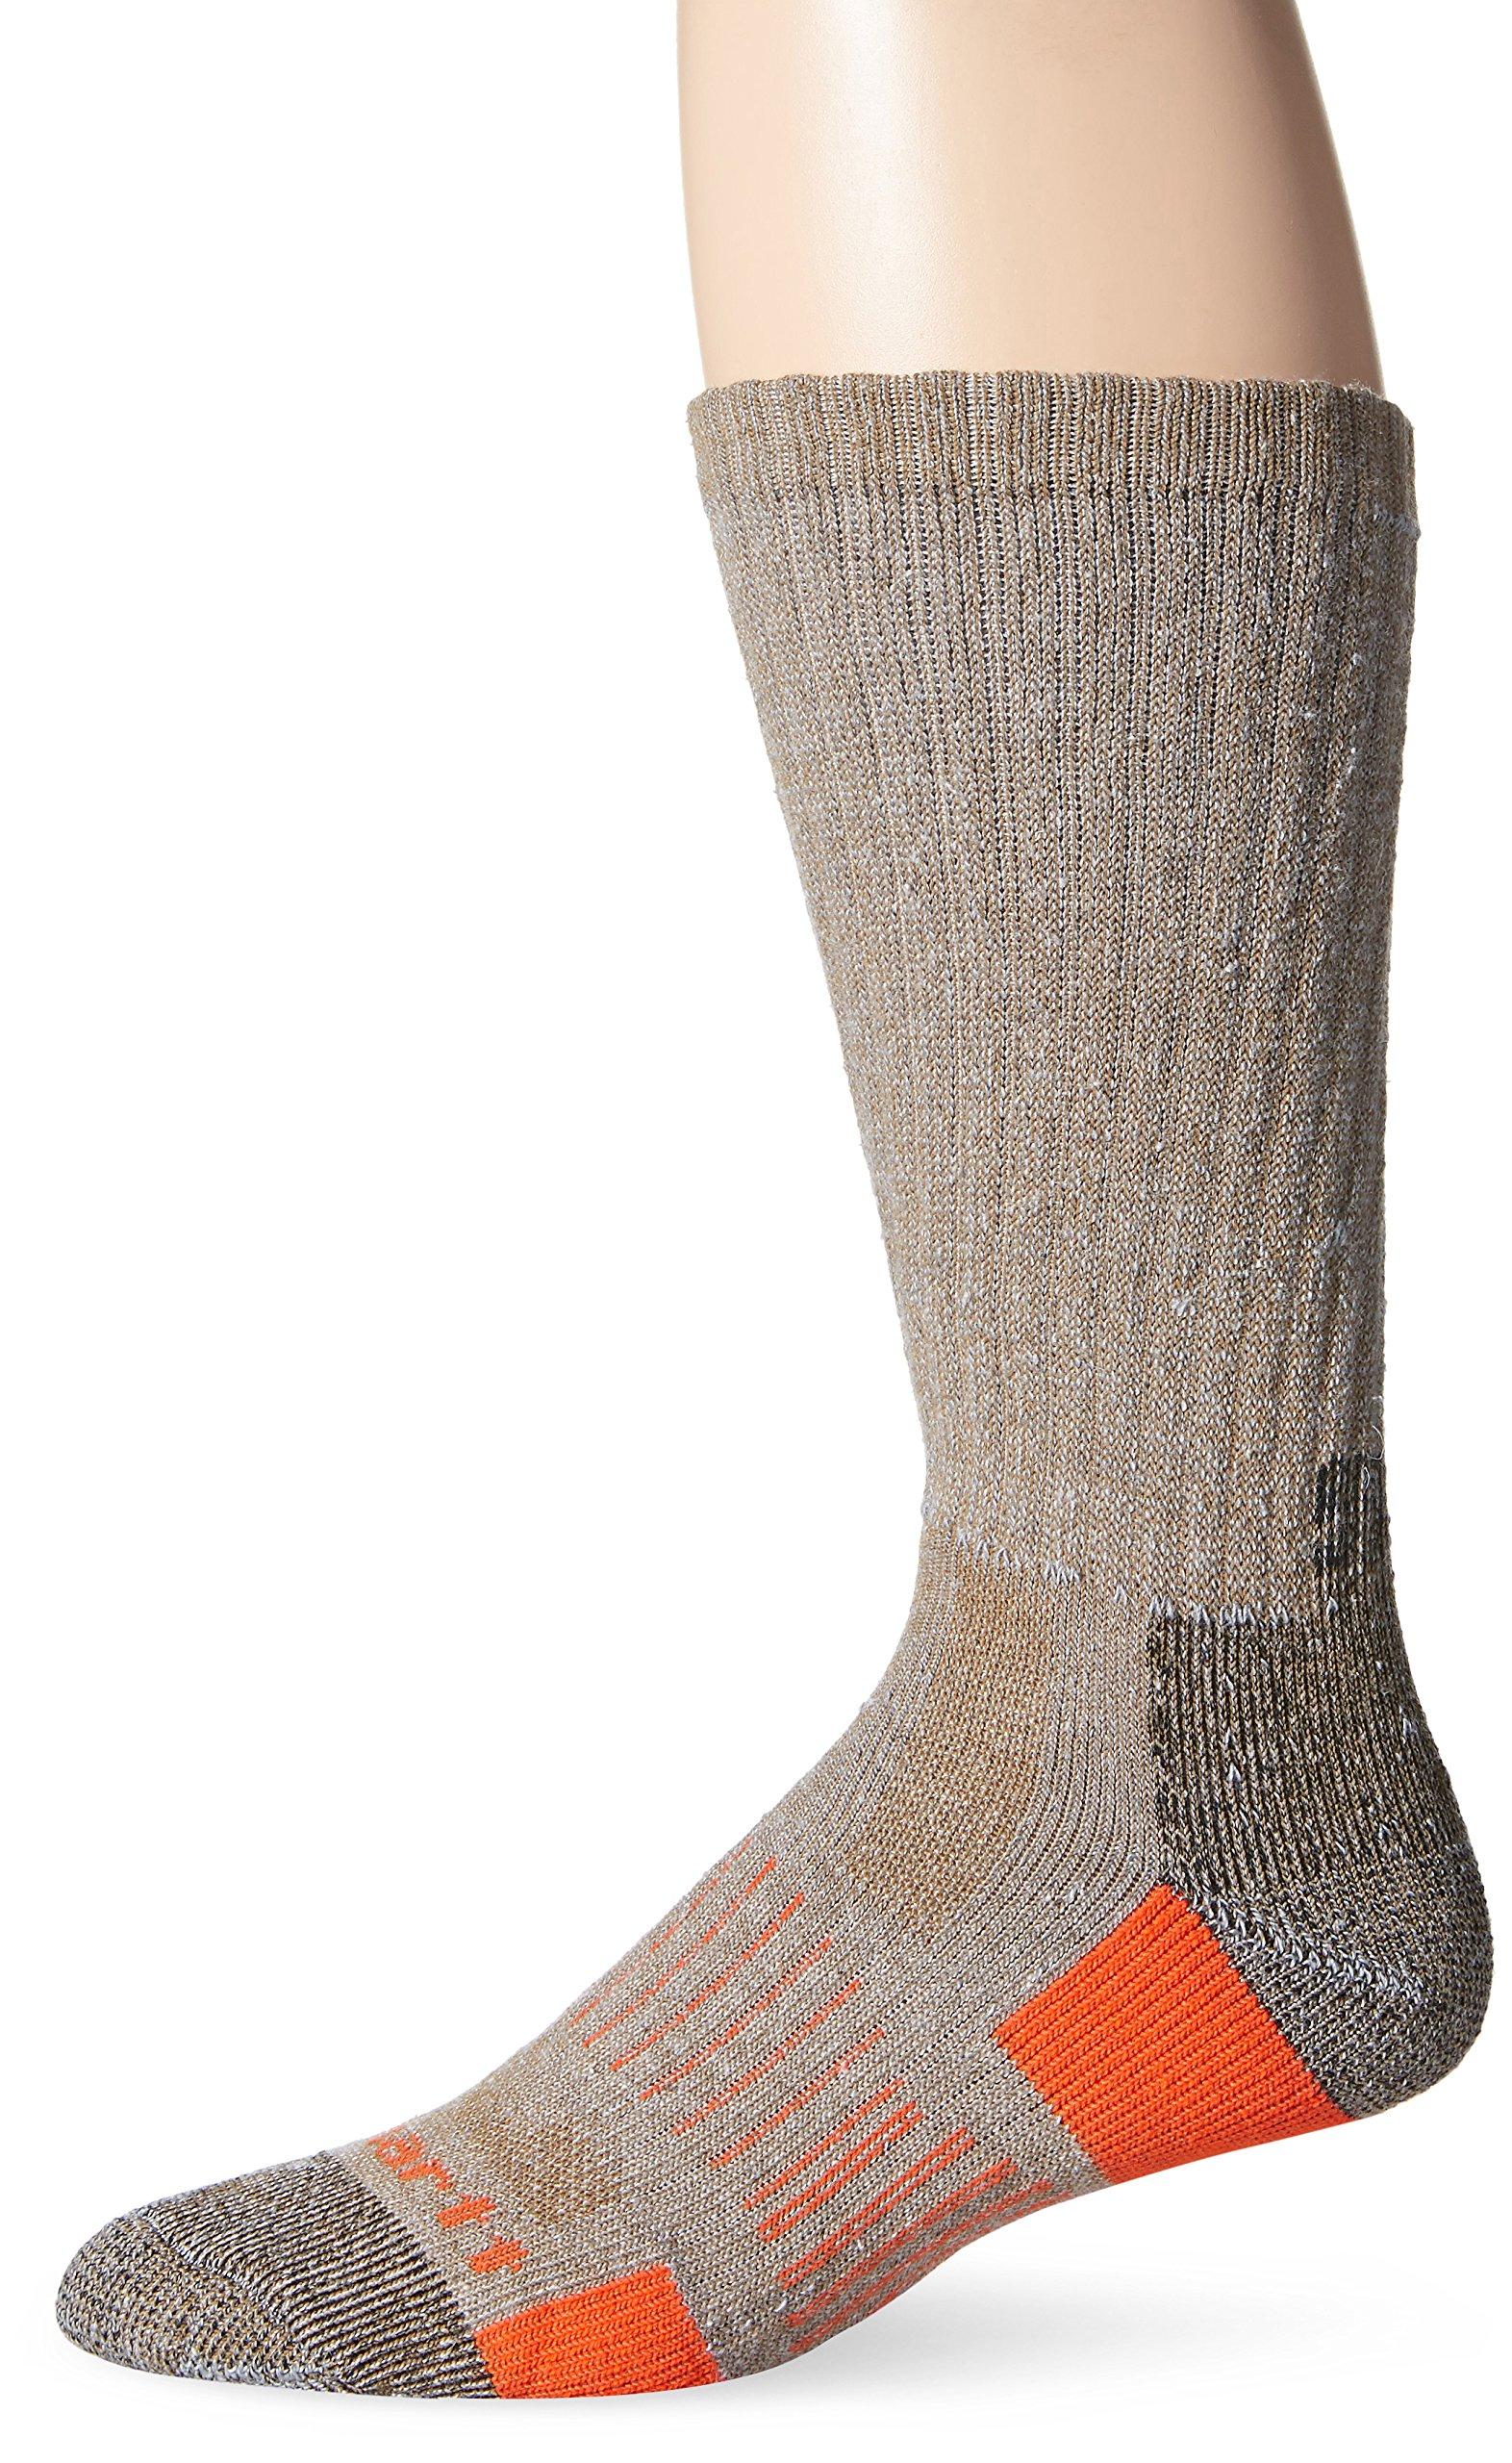 Carhartt Men's 2 Pack All-Terrain Boot Socks, Brown, Sock Size:10-13/Shoe Size: 6-12